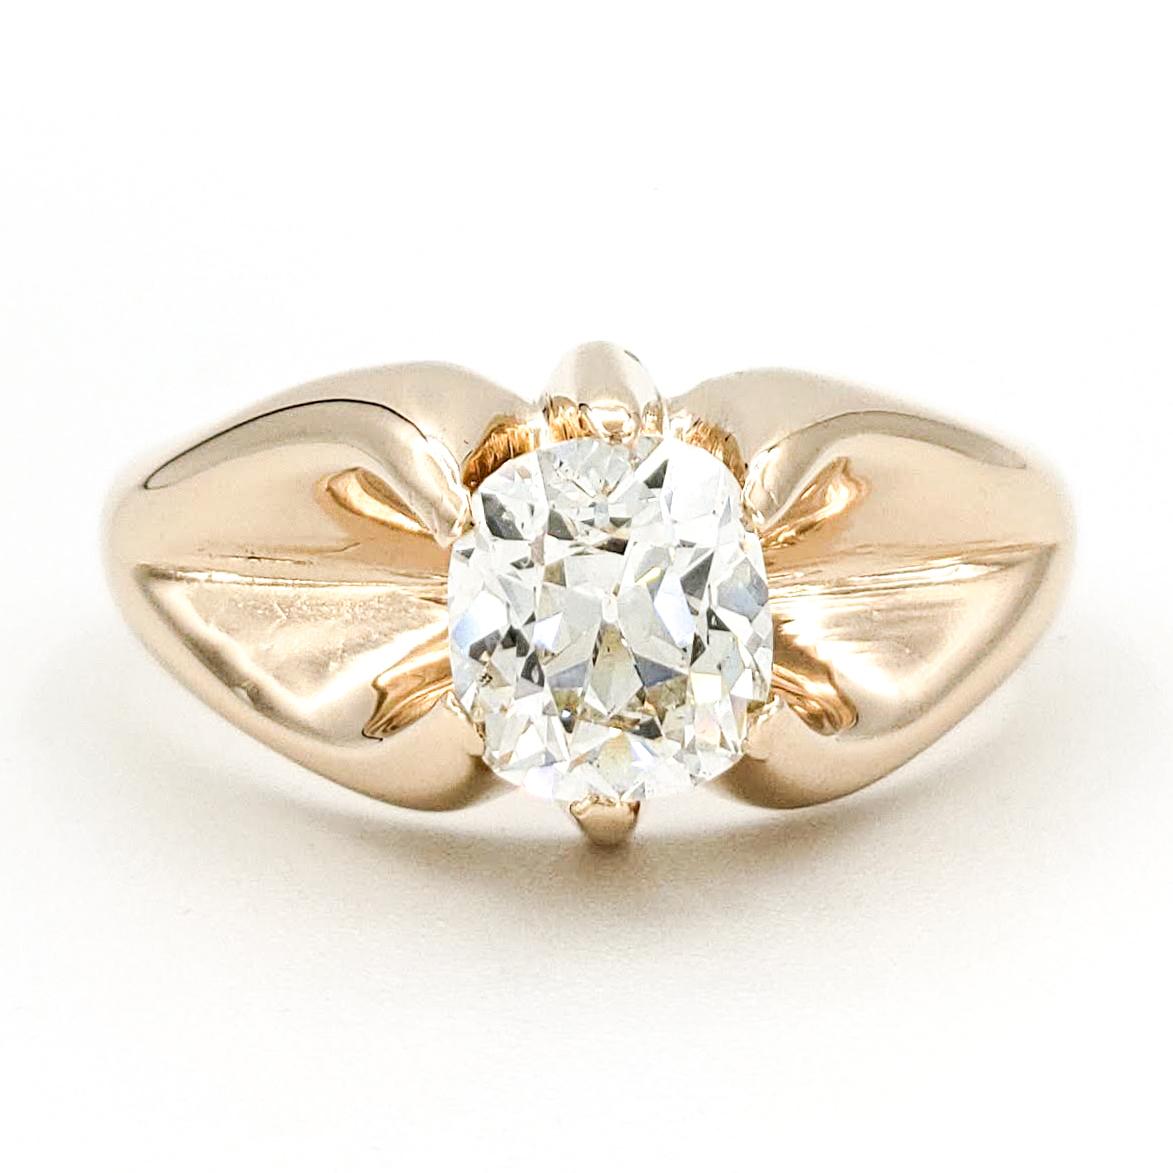 vintage-14-karat-gold-engagement-ring-with-1-13-carat-old-mine-cut-diamond-egl-g-si2